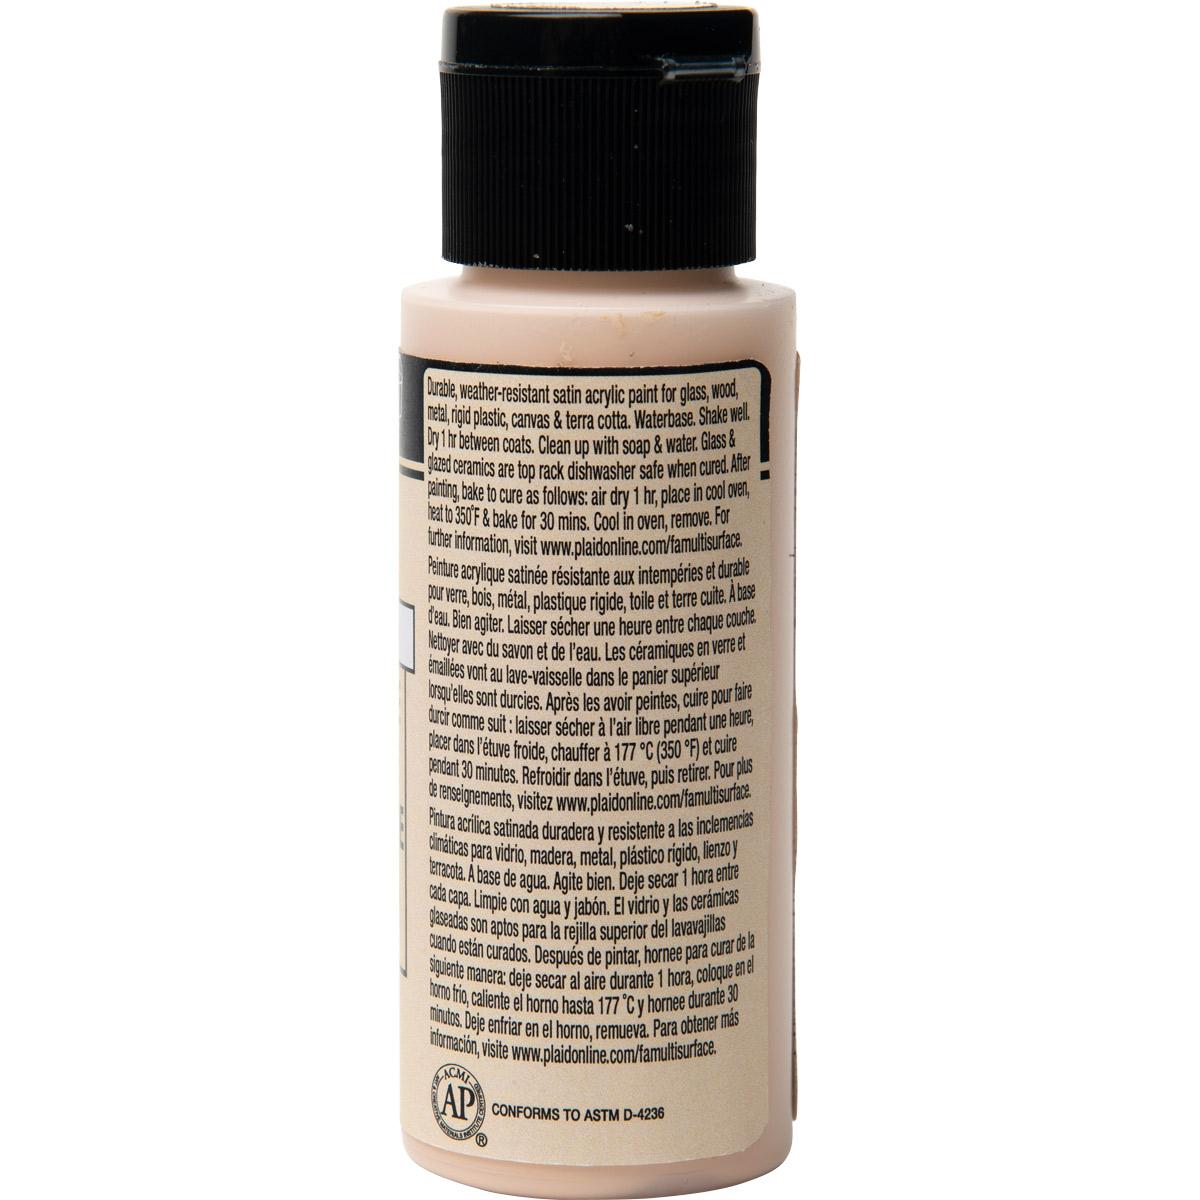 FolkArt ® Multi-Surface Satin Acrylic Paints - Cool Bisque, 2 oz.